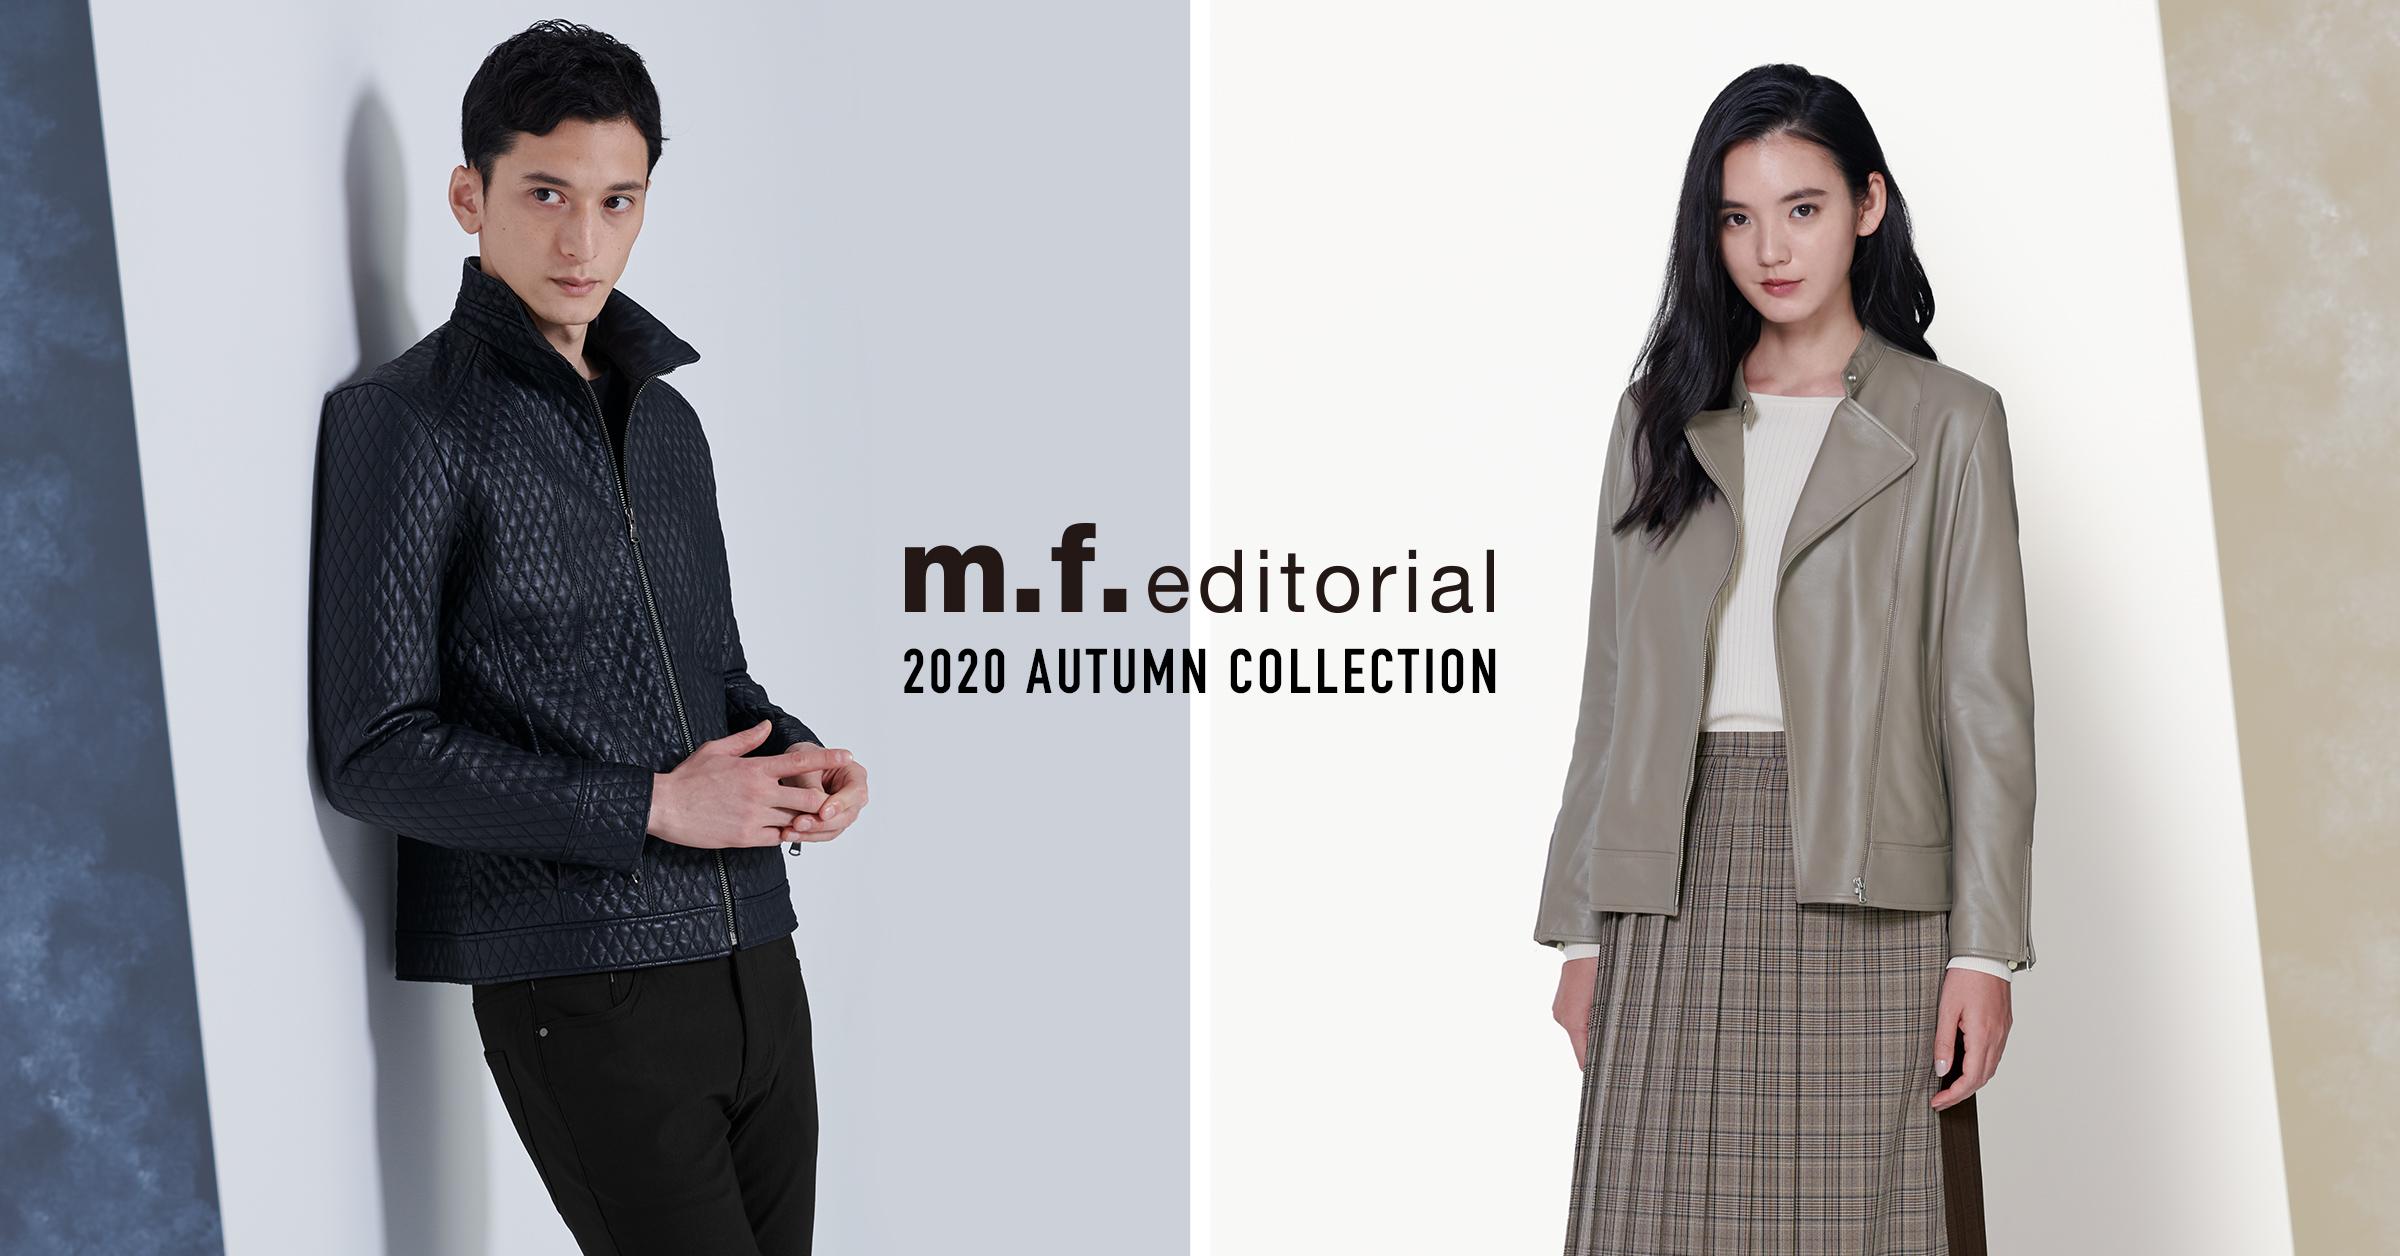 mf.editorial 2020 AUTUMN COLLECTION